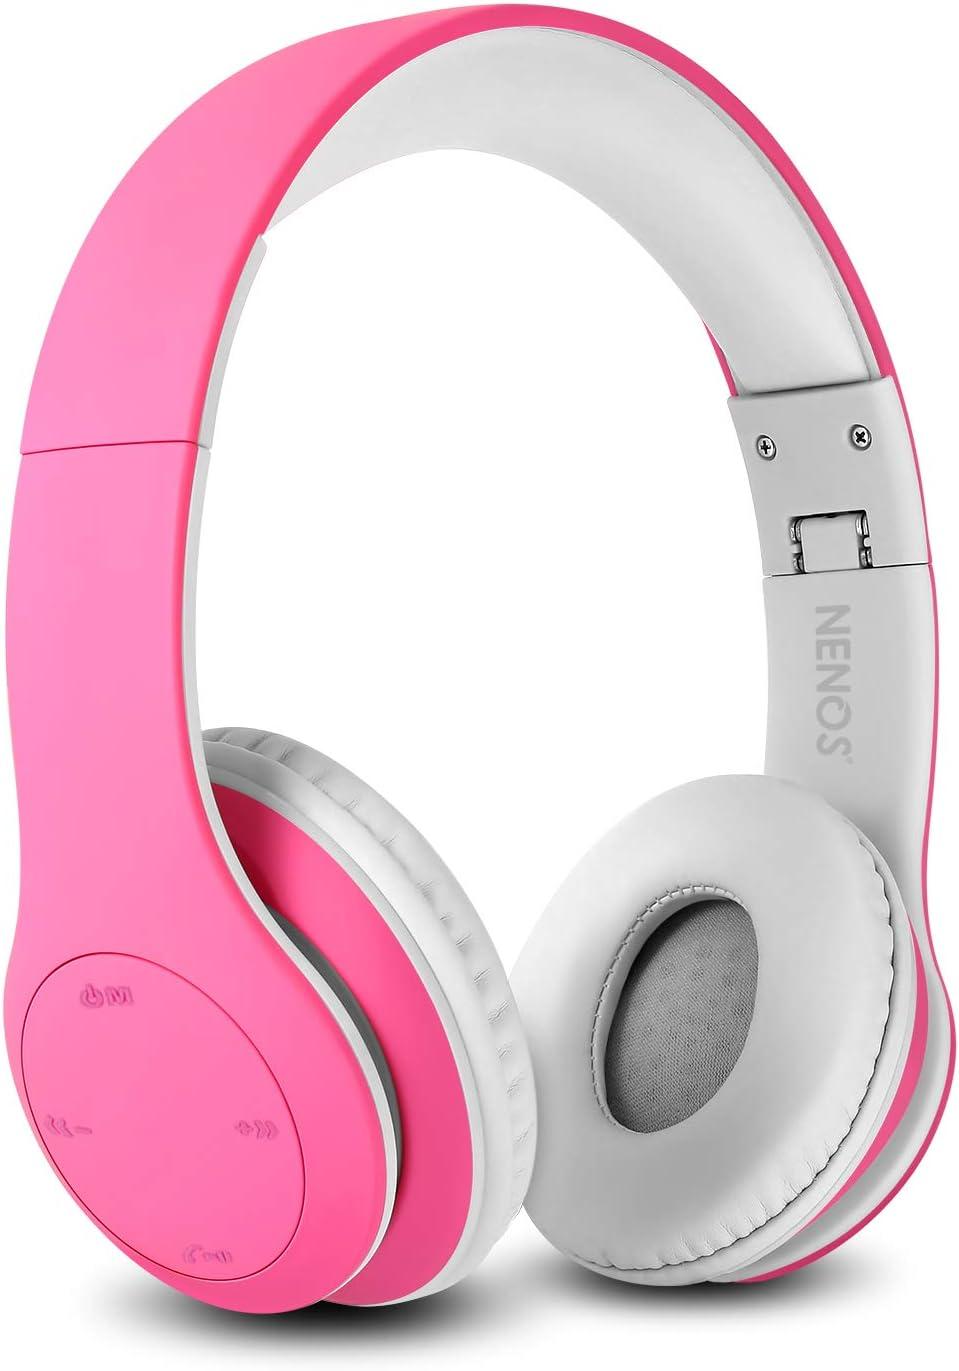 Nenos Bluetooth Kids Headphones Wireless Kids Headphones 93dB Limited Volume Wireless Headphones for Kids (Pink)